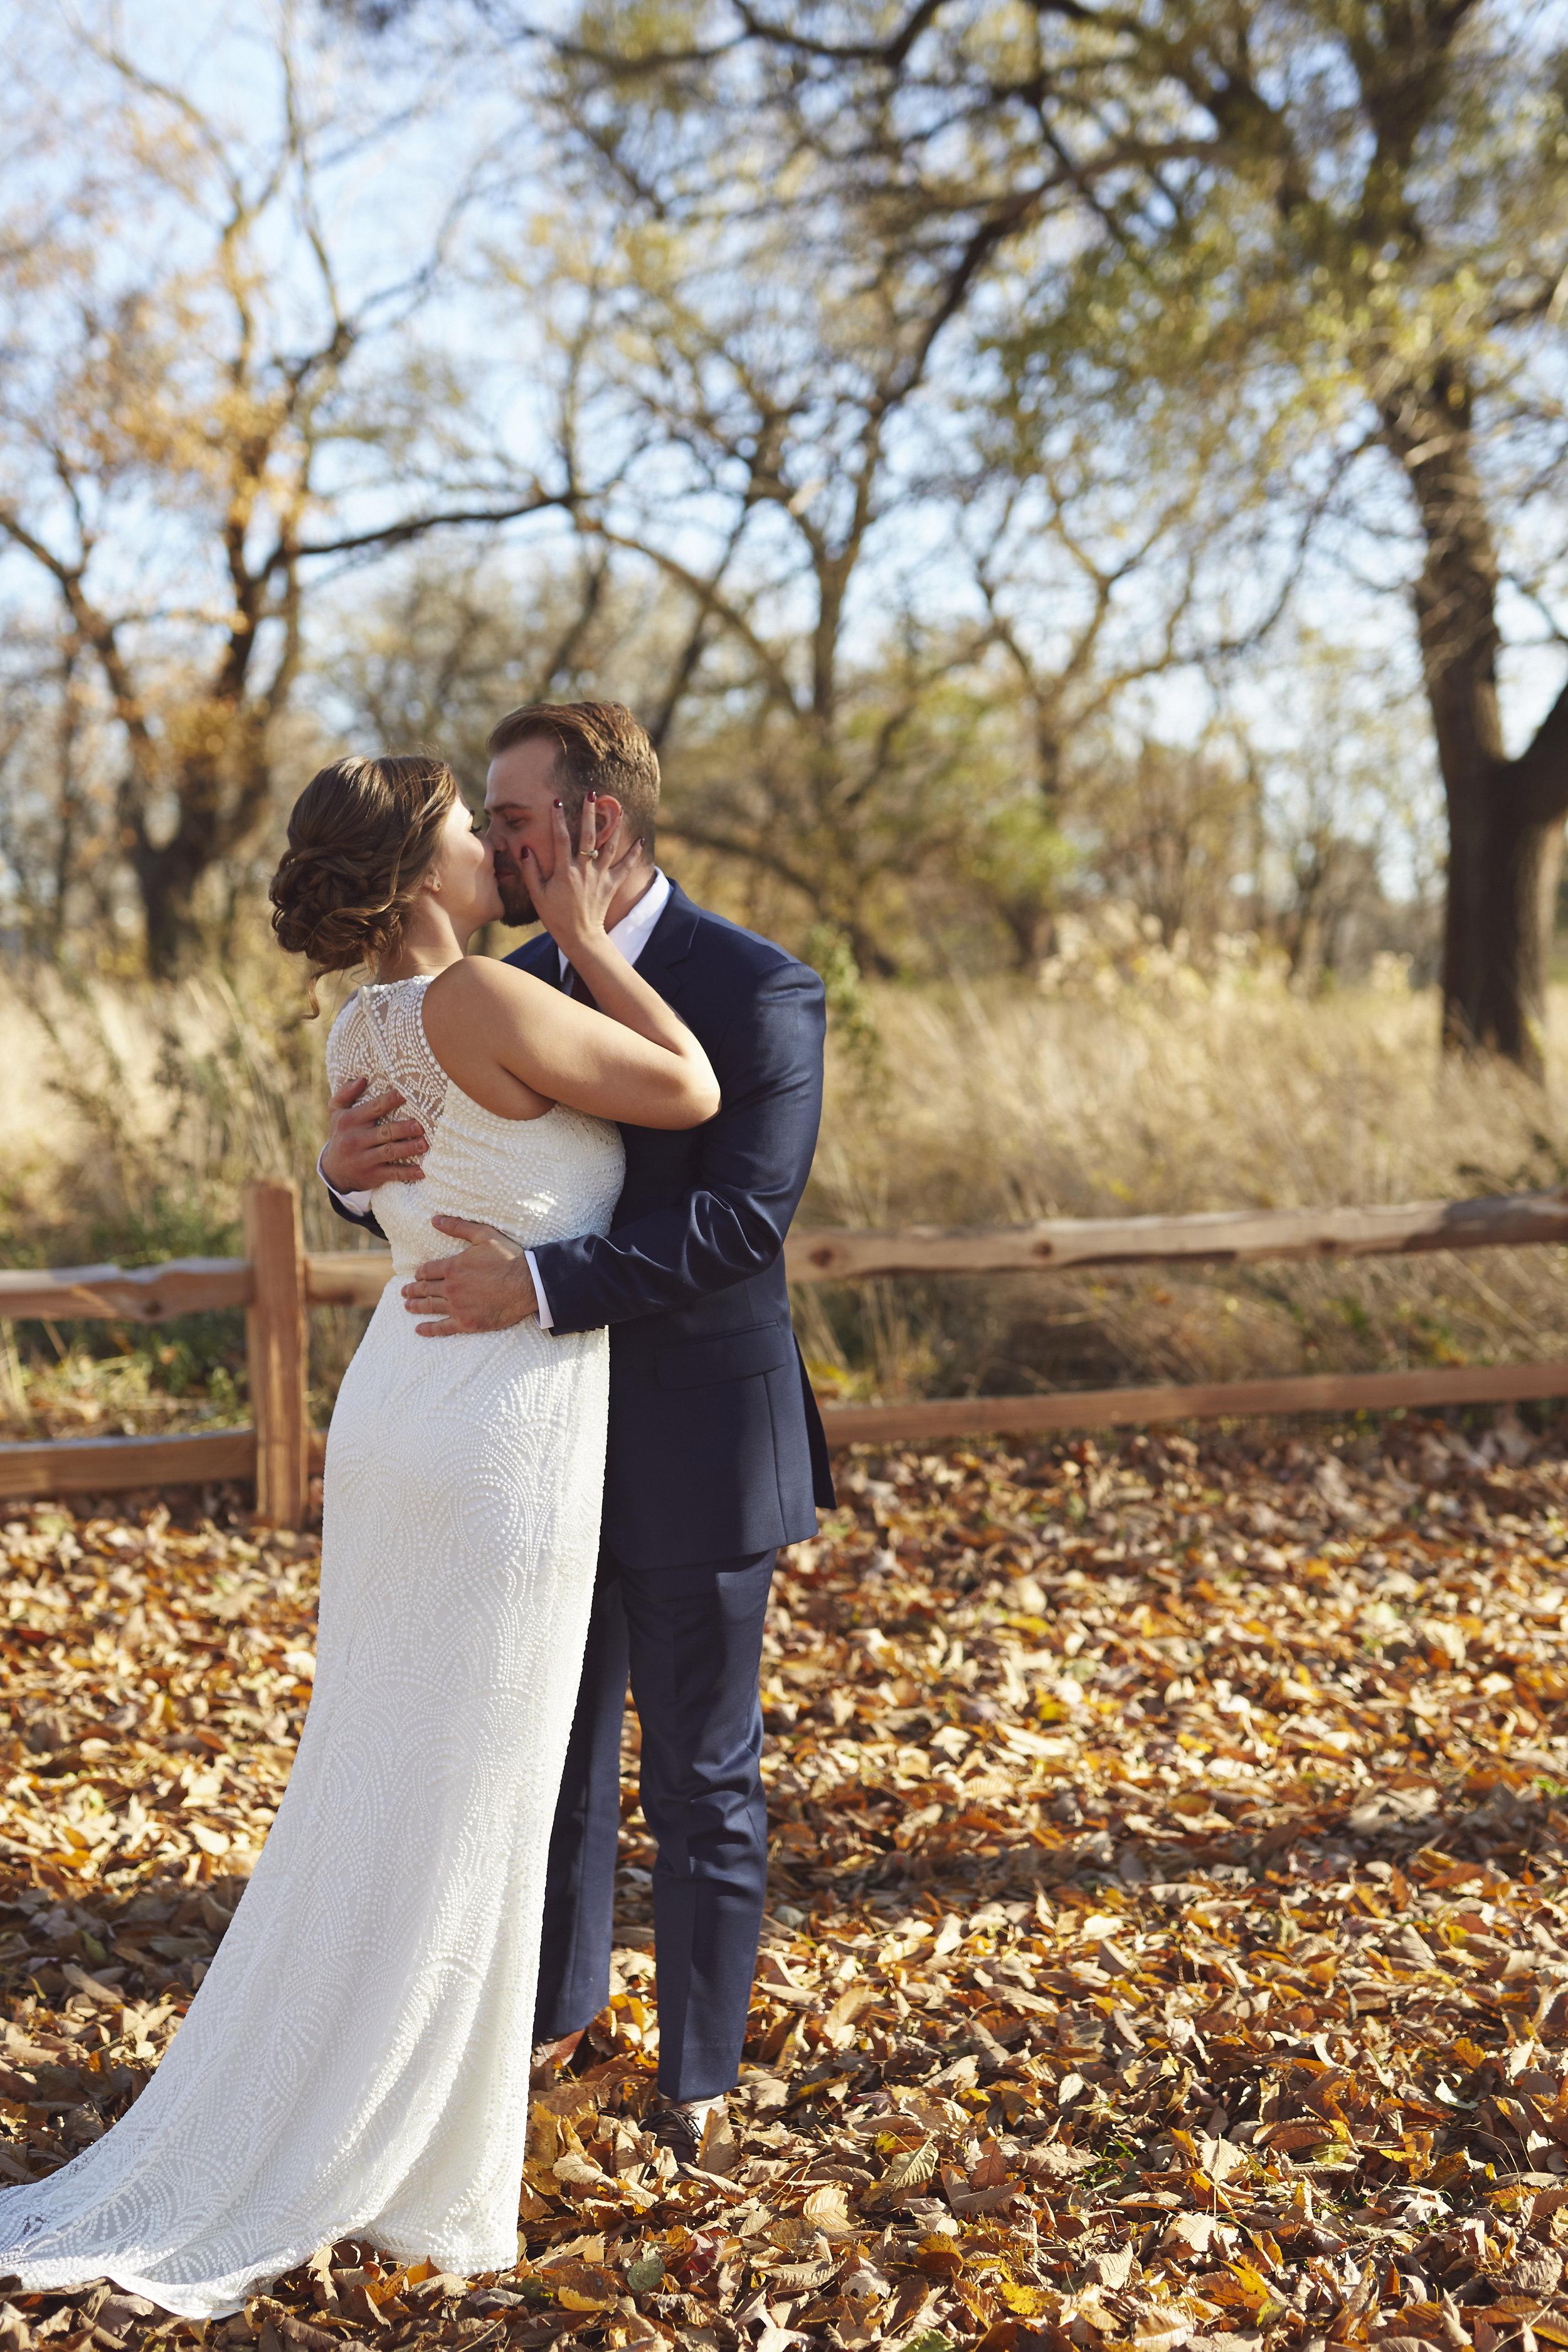 Jen & Ben Wedding - benromangphoto - 6I5A9457.jpg